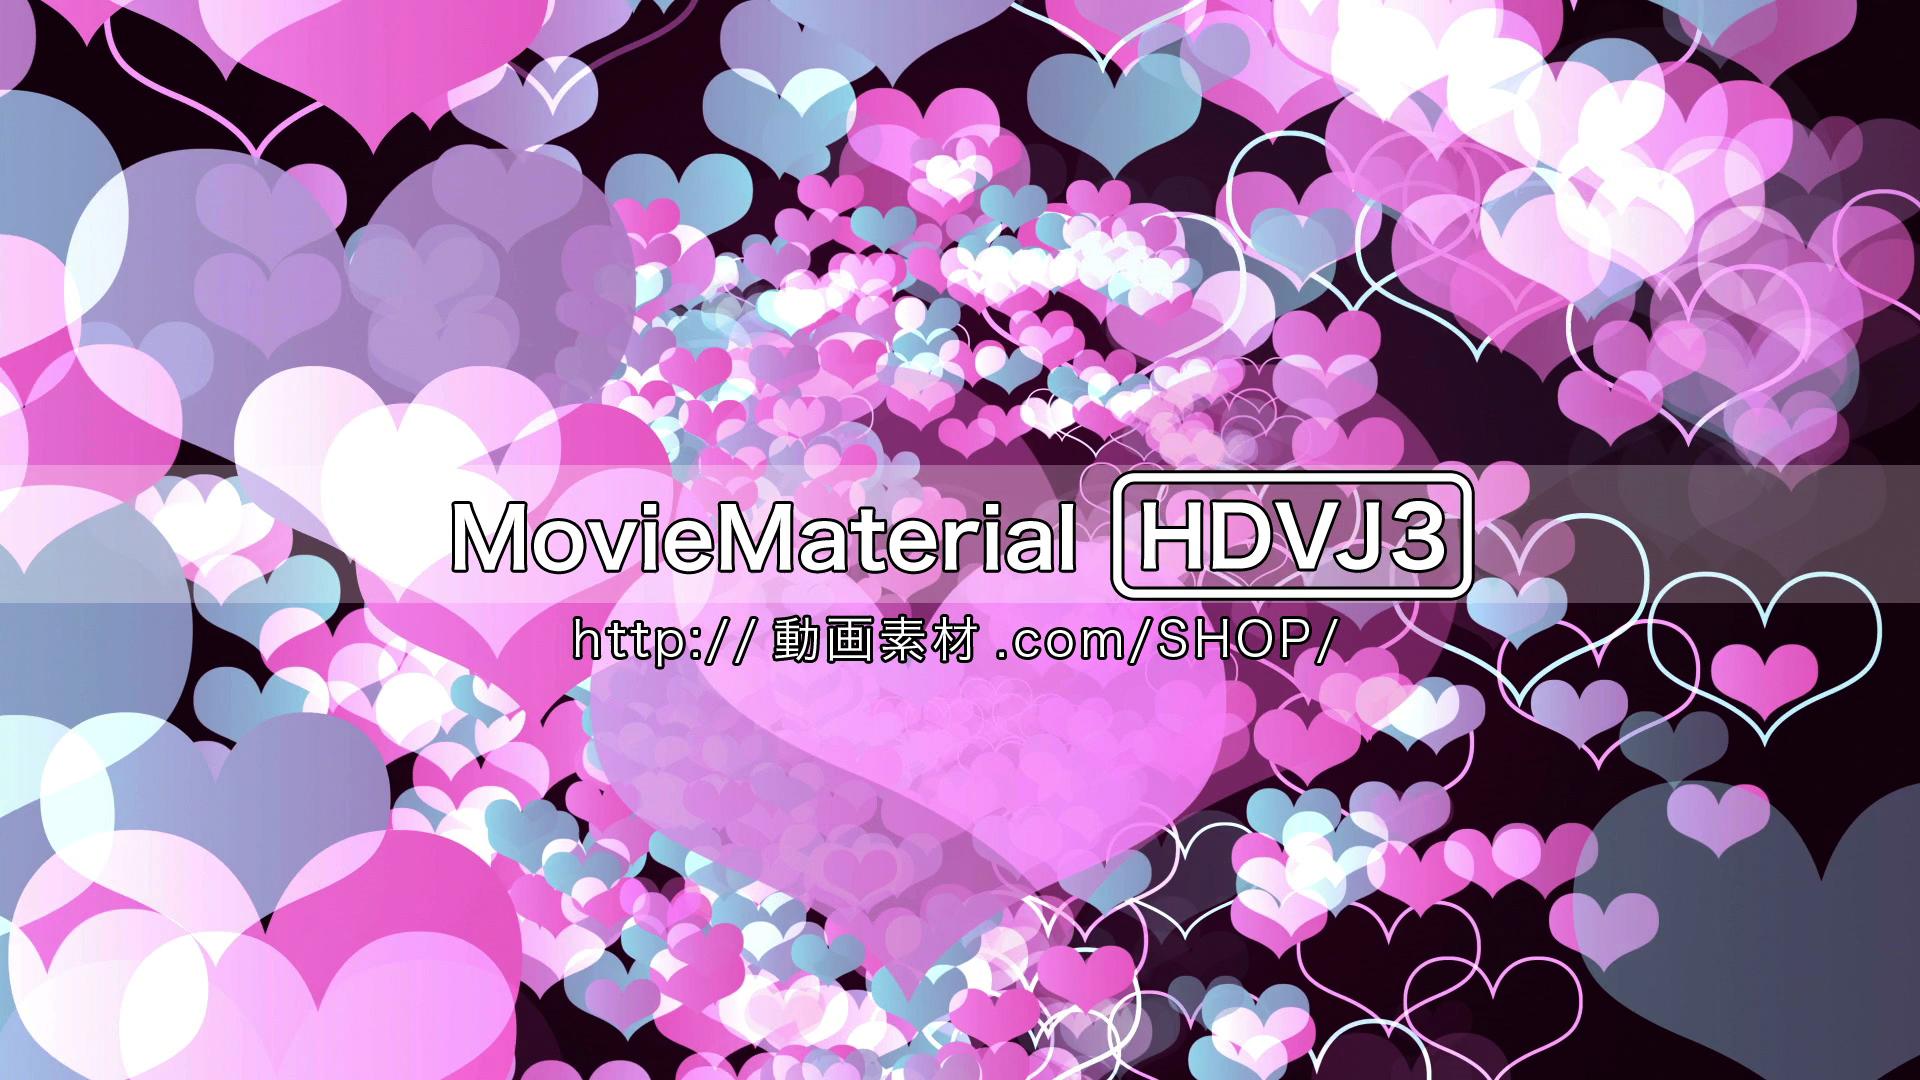 MovieMaterial HDVJ3 フルハイビジョンVJ動画素材集 画像2